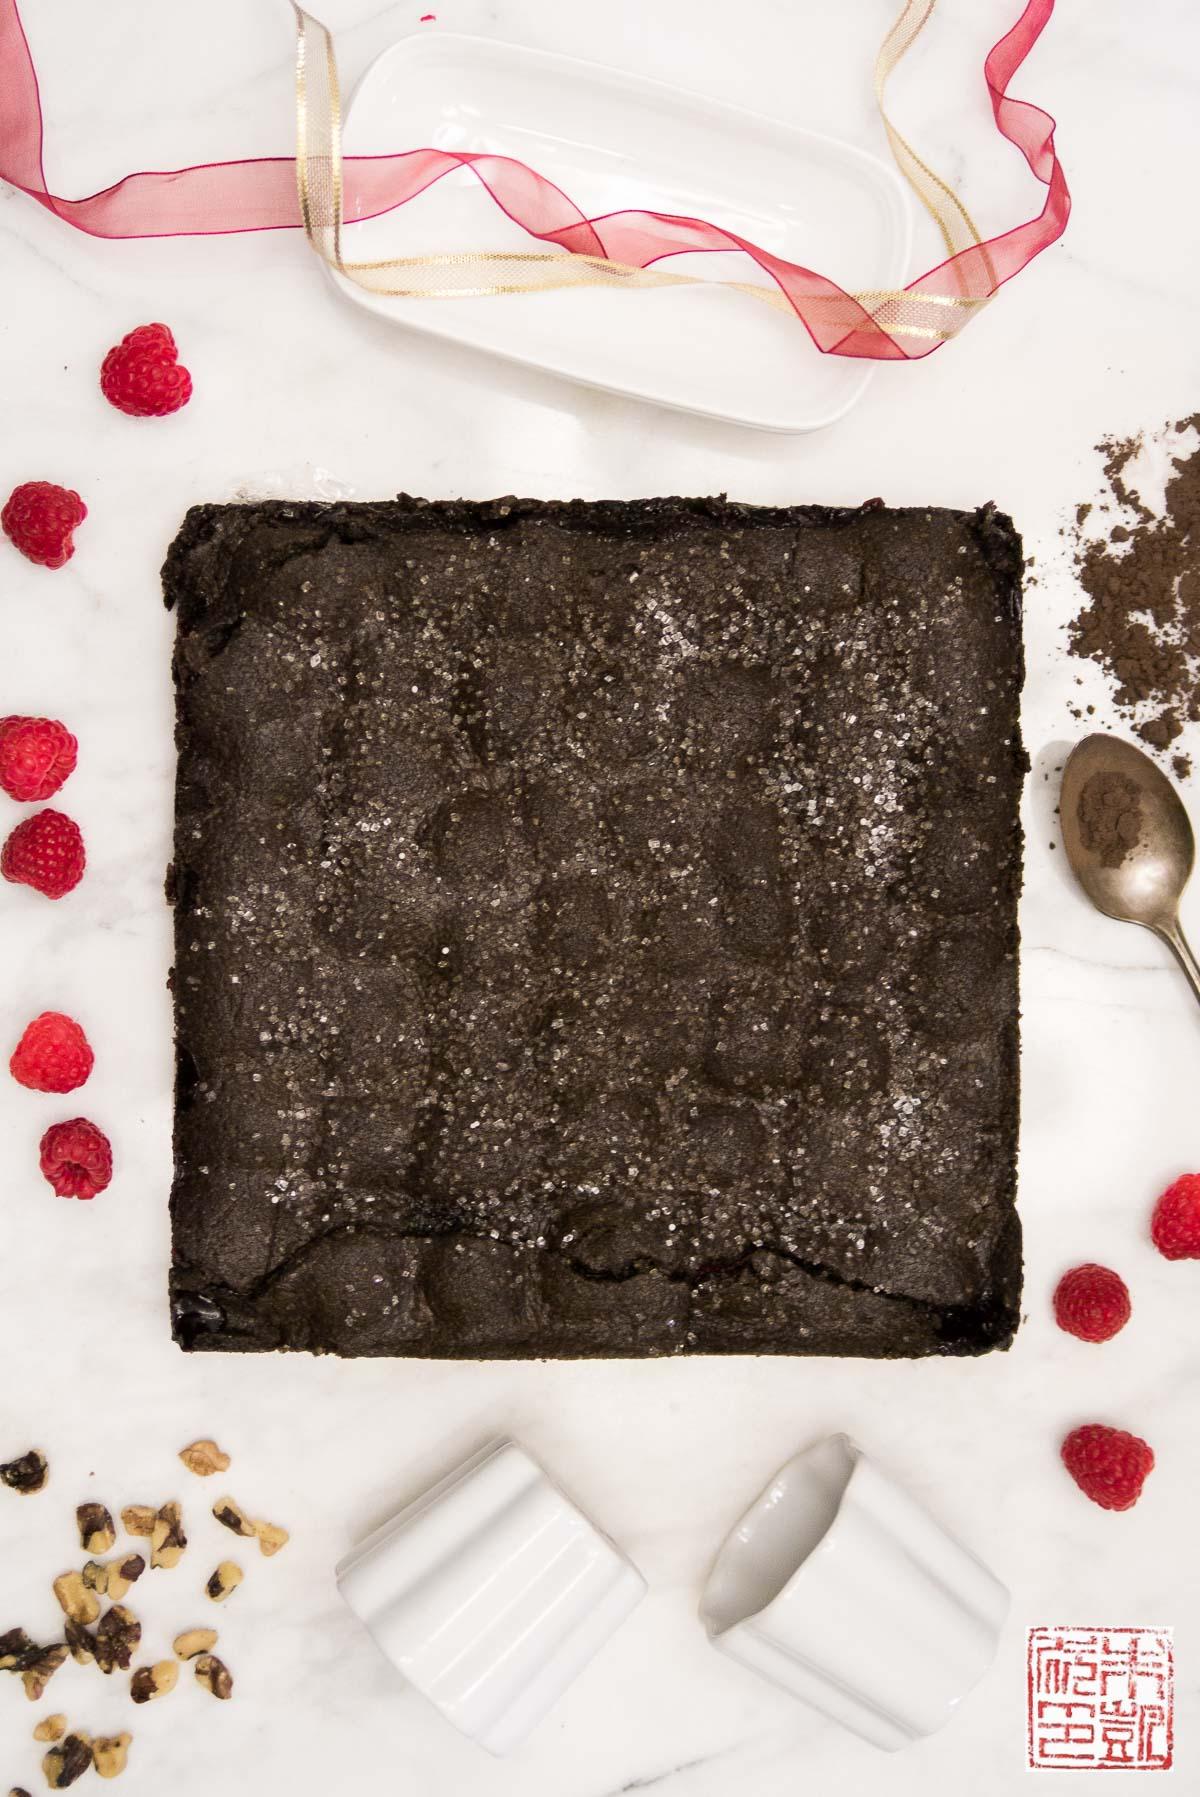 ... Review}:Dorie's Thanksgiving Bars from Dorie's Cookies - Dessert ...